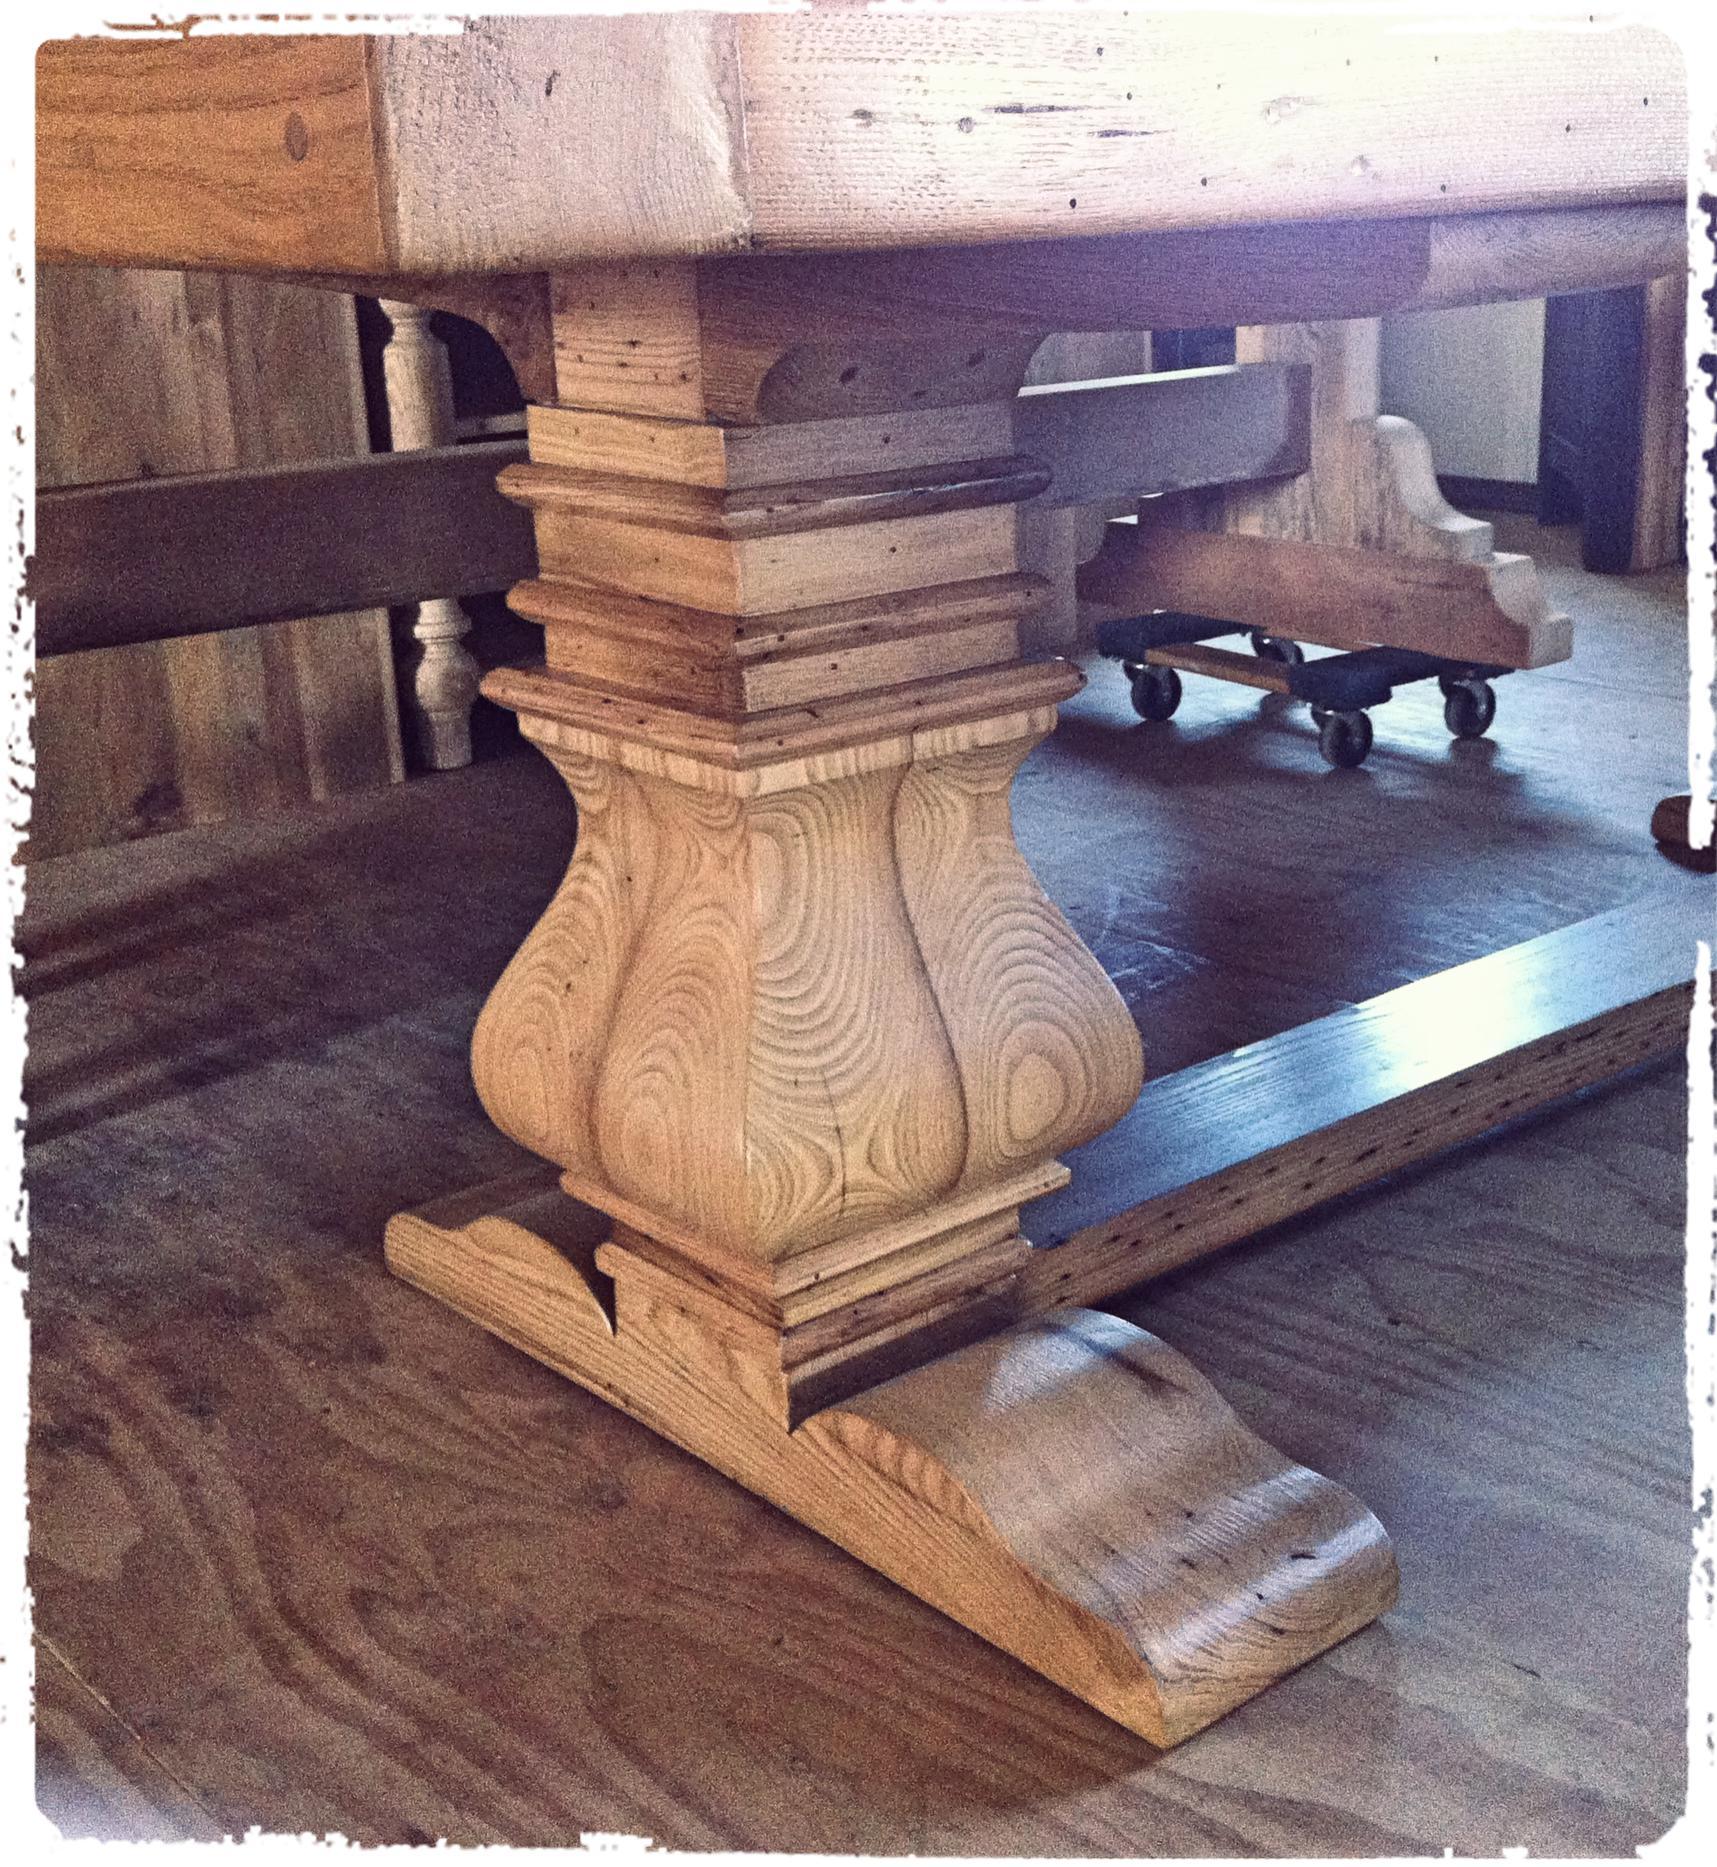 Barn Wood Furniture For Sale: We Now Offer American Chestnut Reclaimed Barnwood Furniture